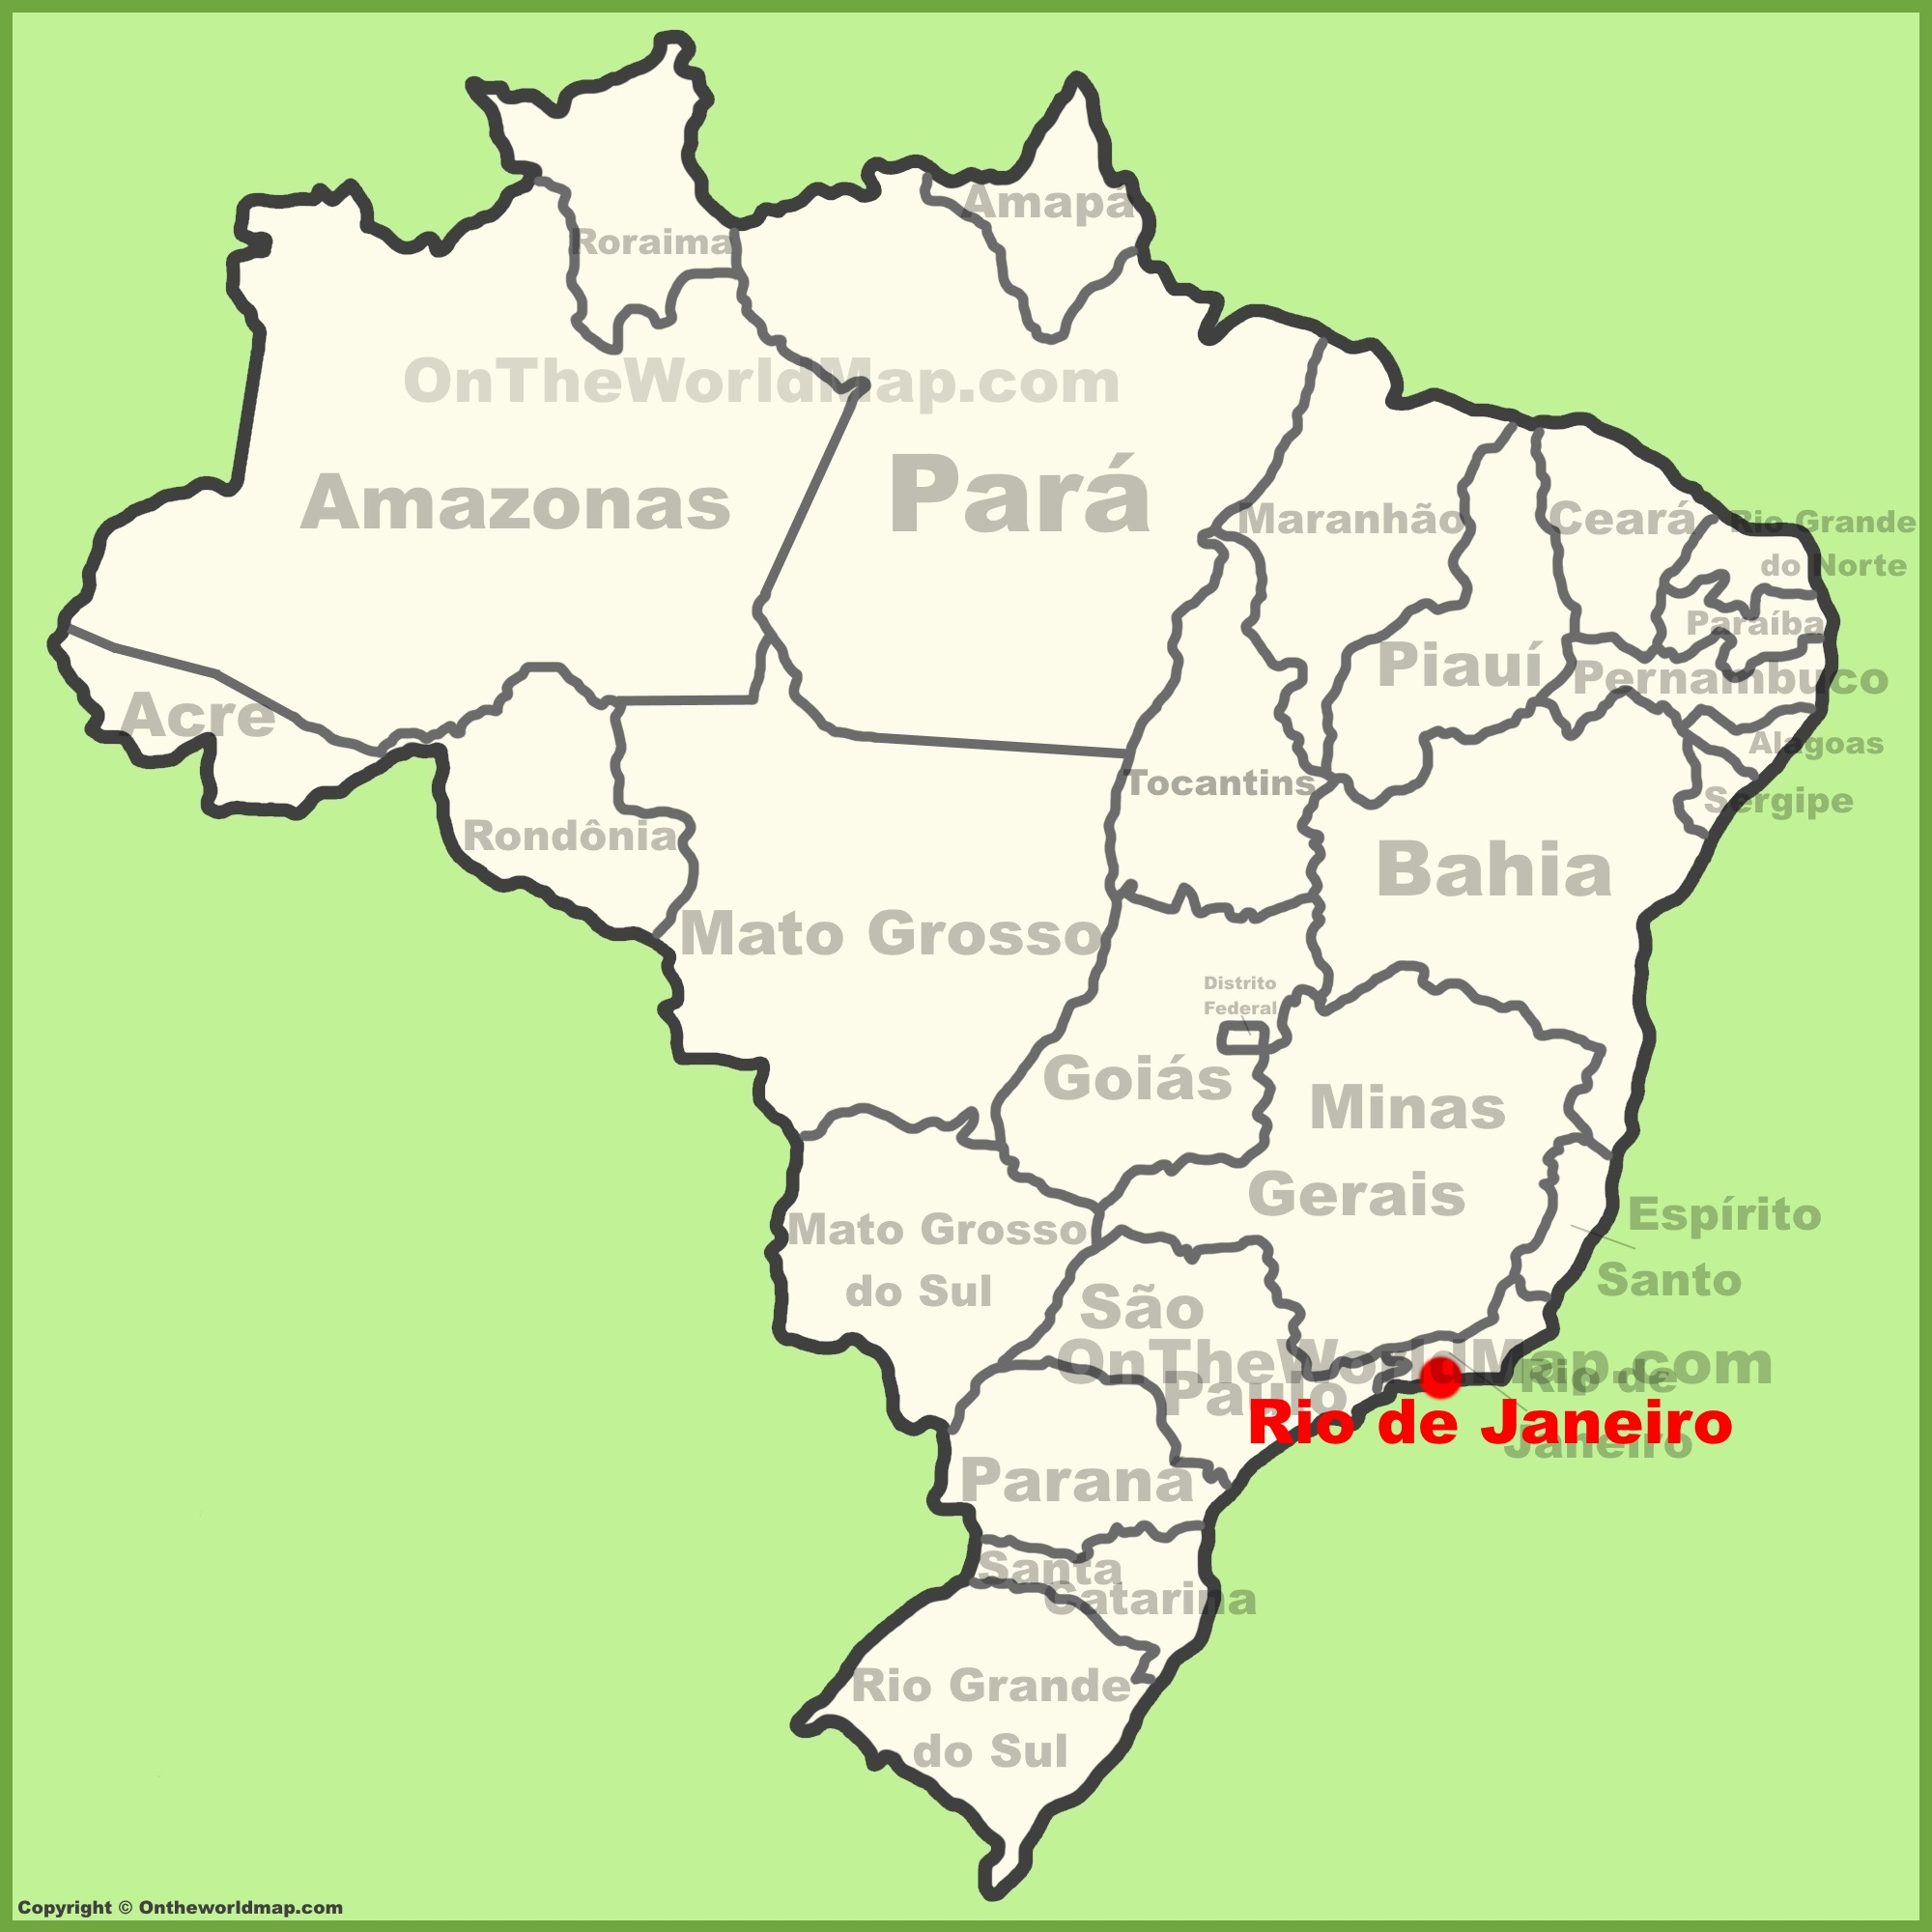 Rio Map Brazil Rio de Janeiro location on the Brazil map